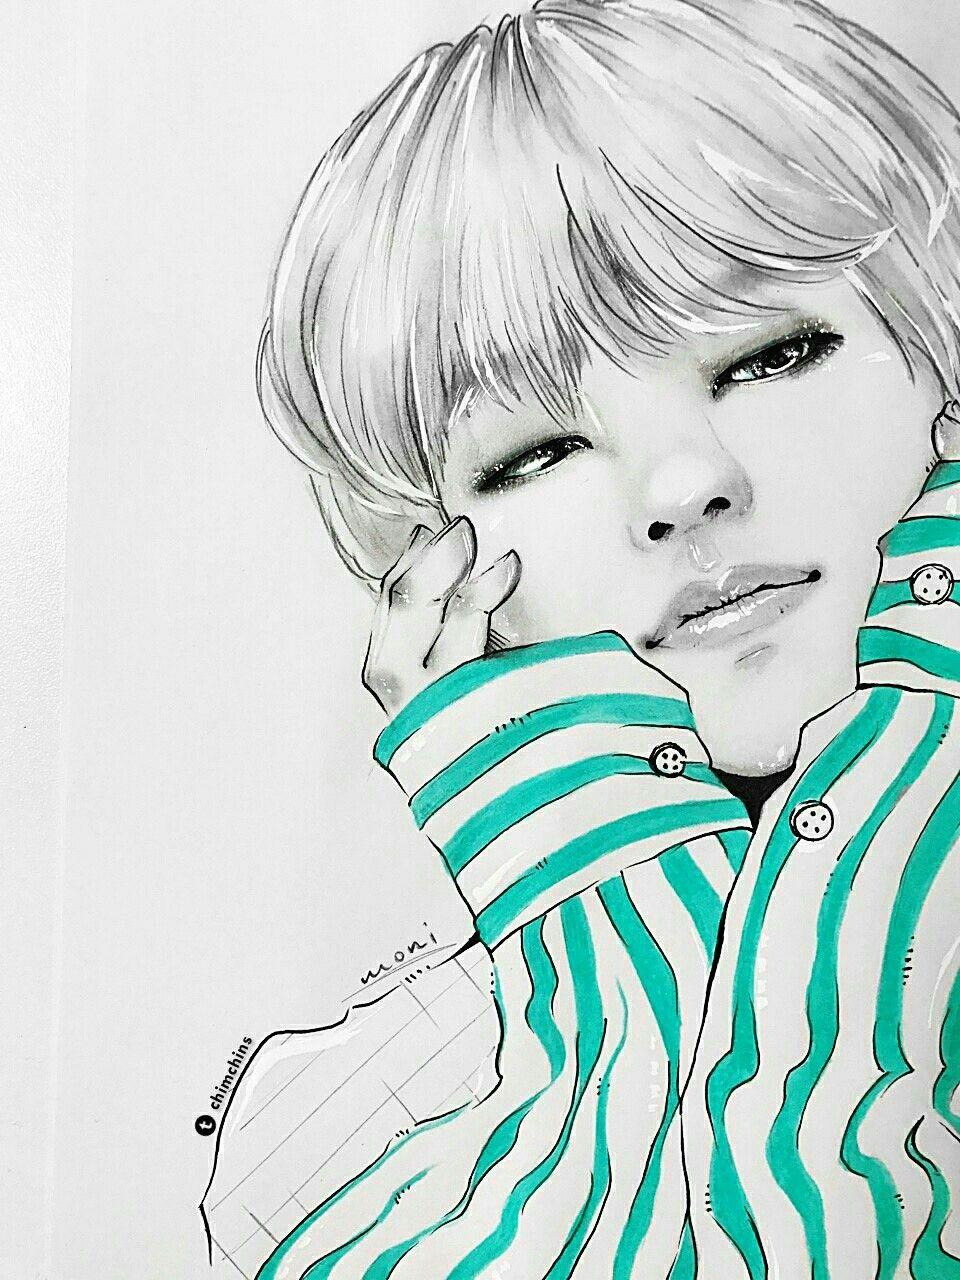 Pin oleh StanSan di BTS art   Orang